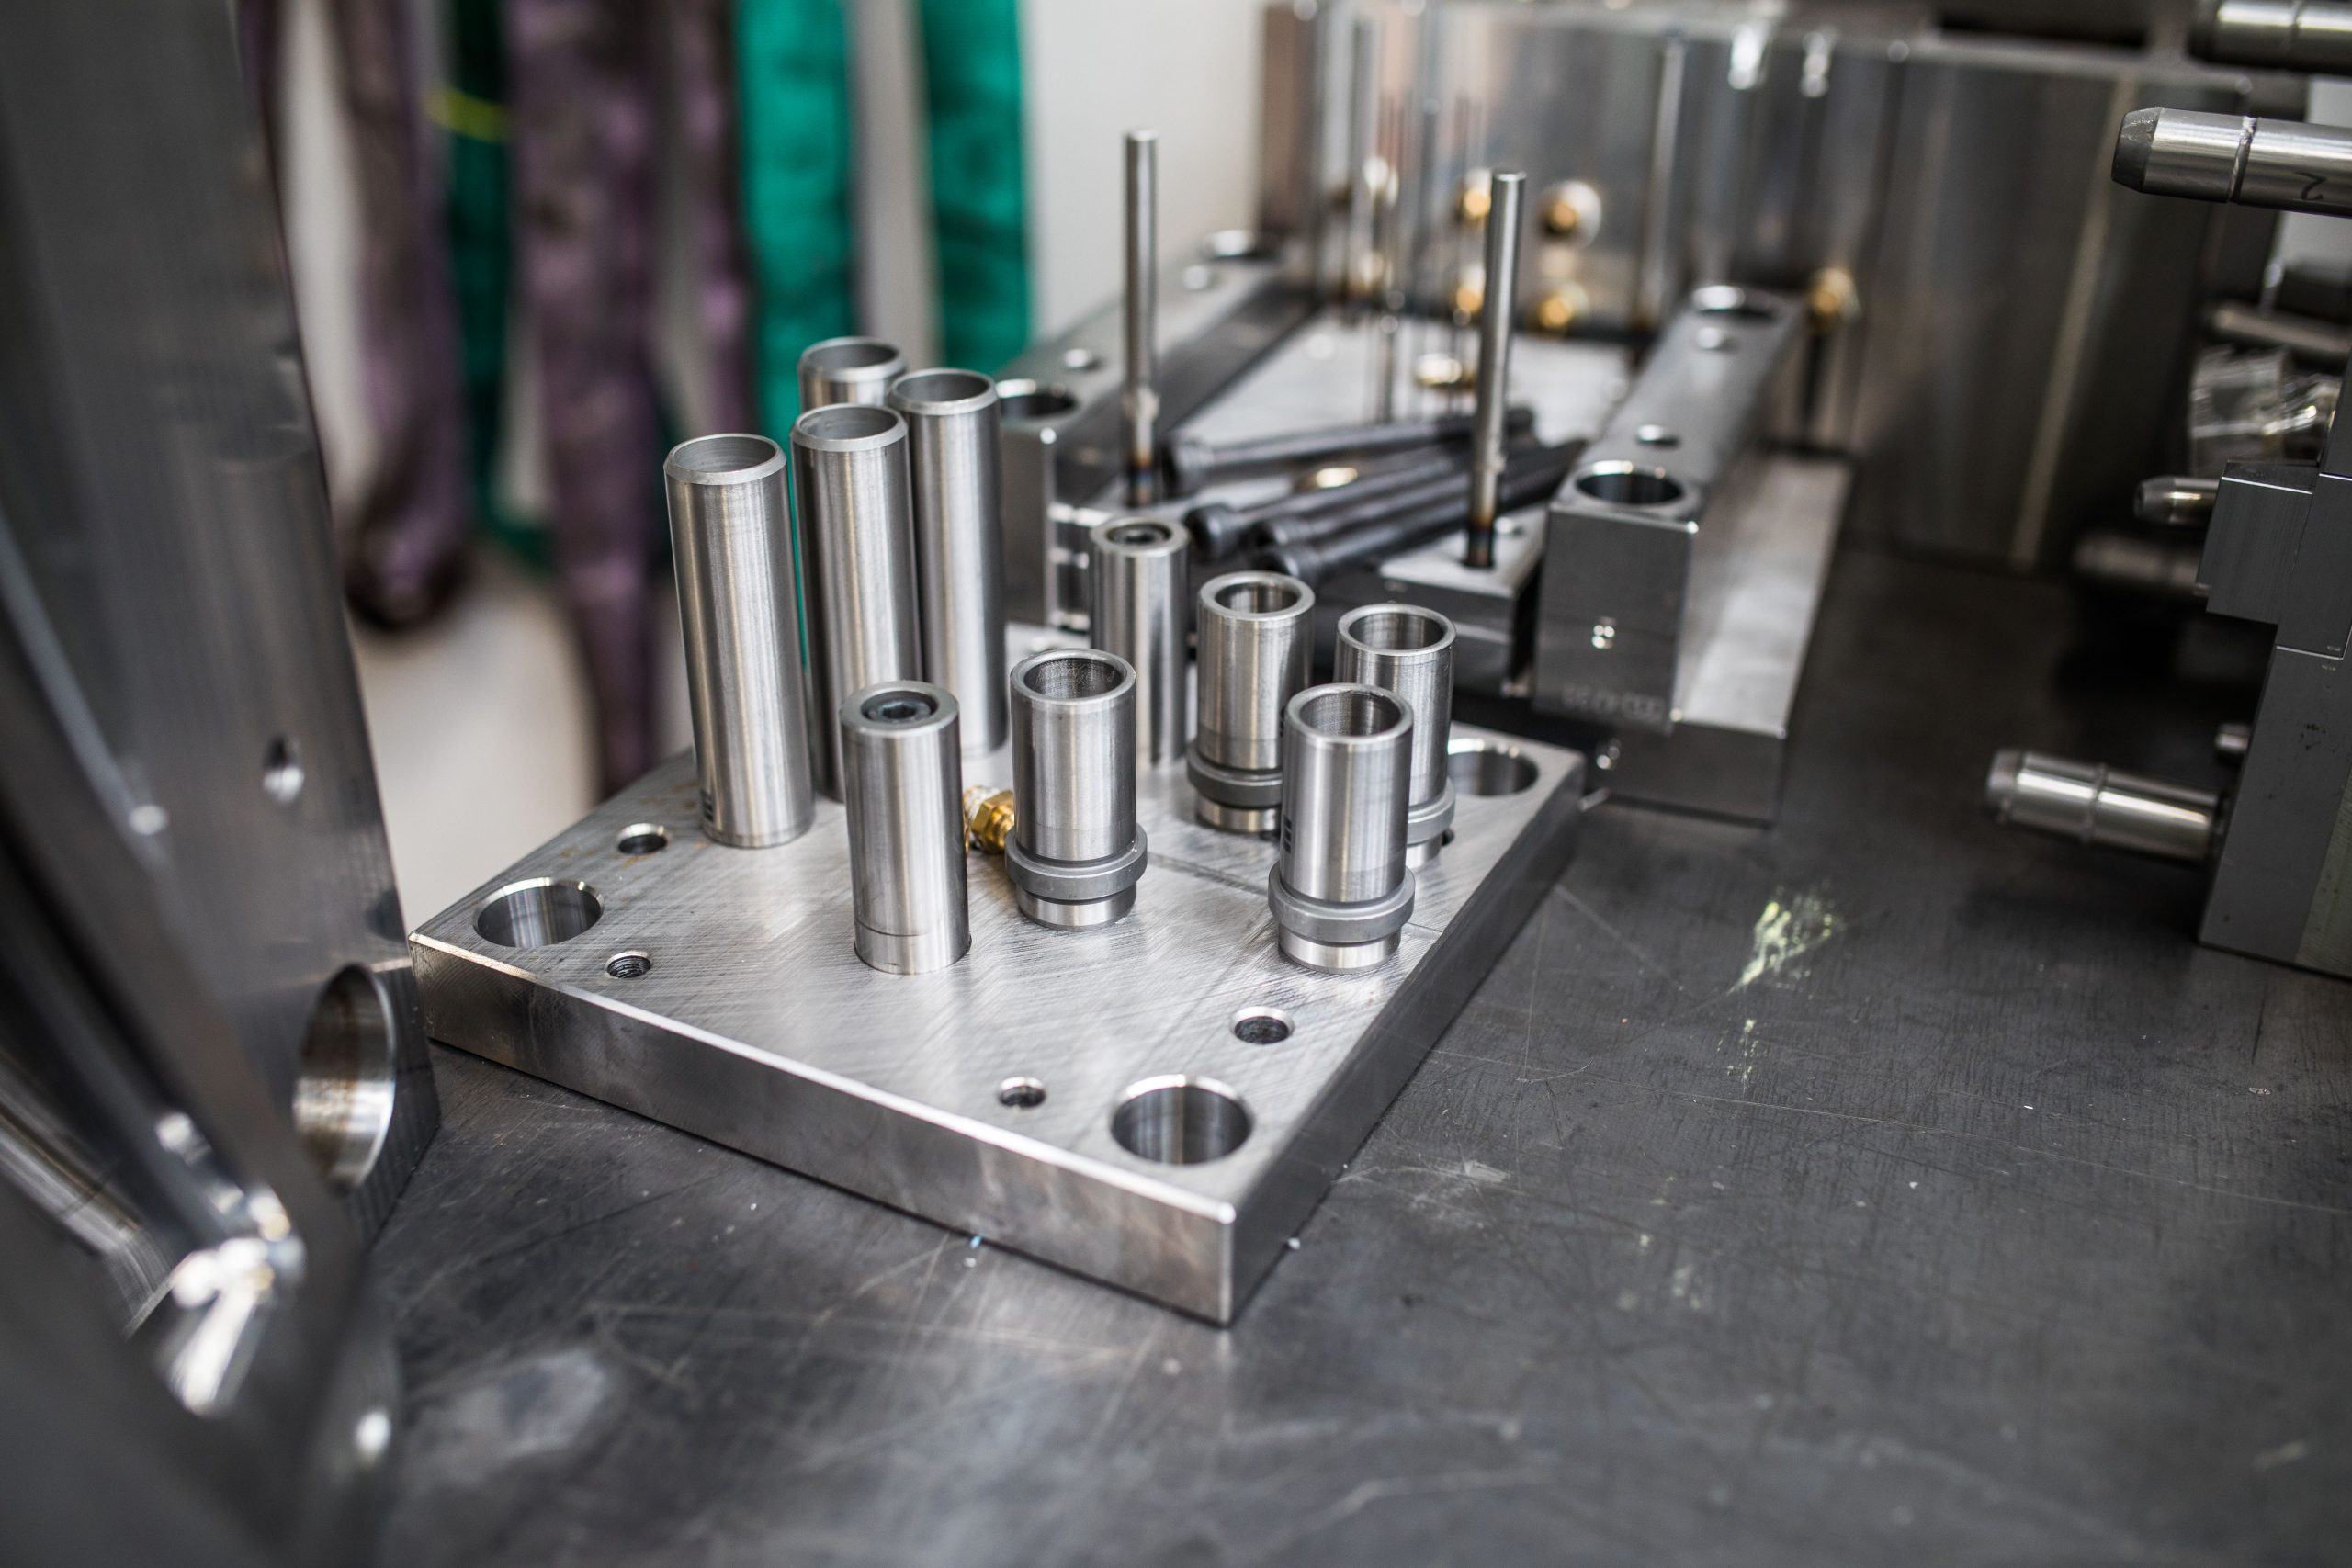 Close up of tool parts